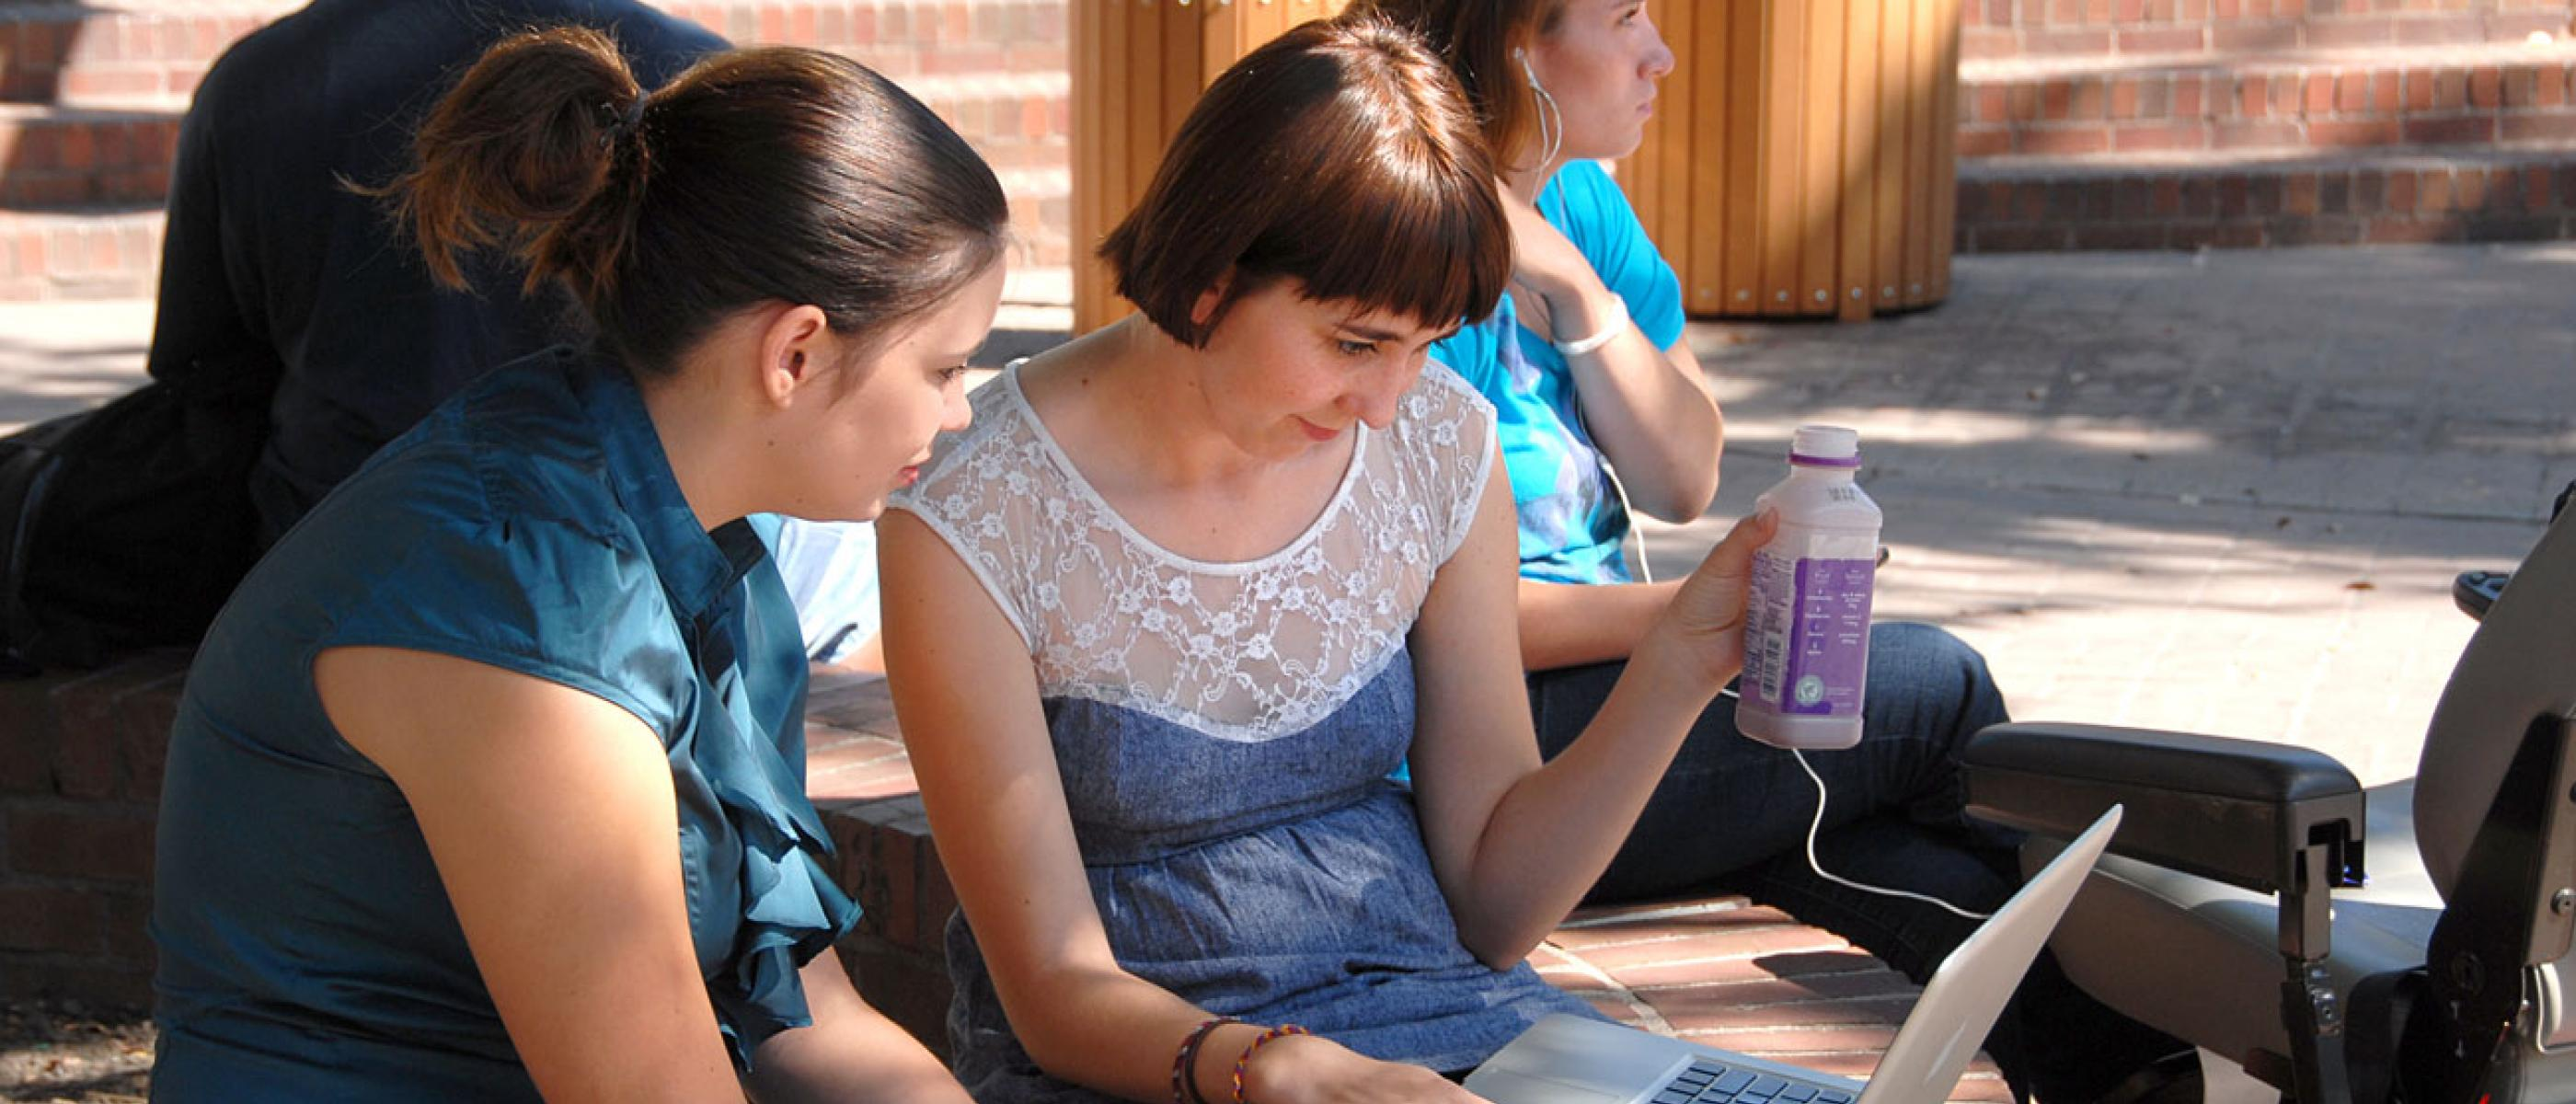 Students work together